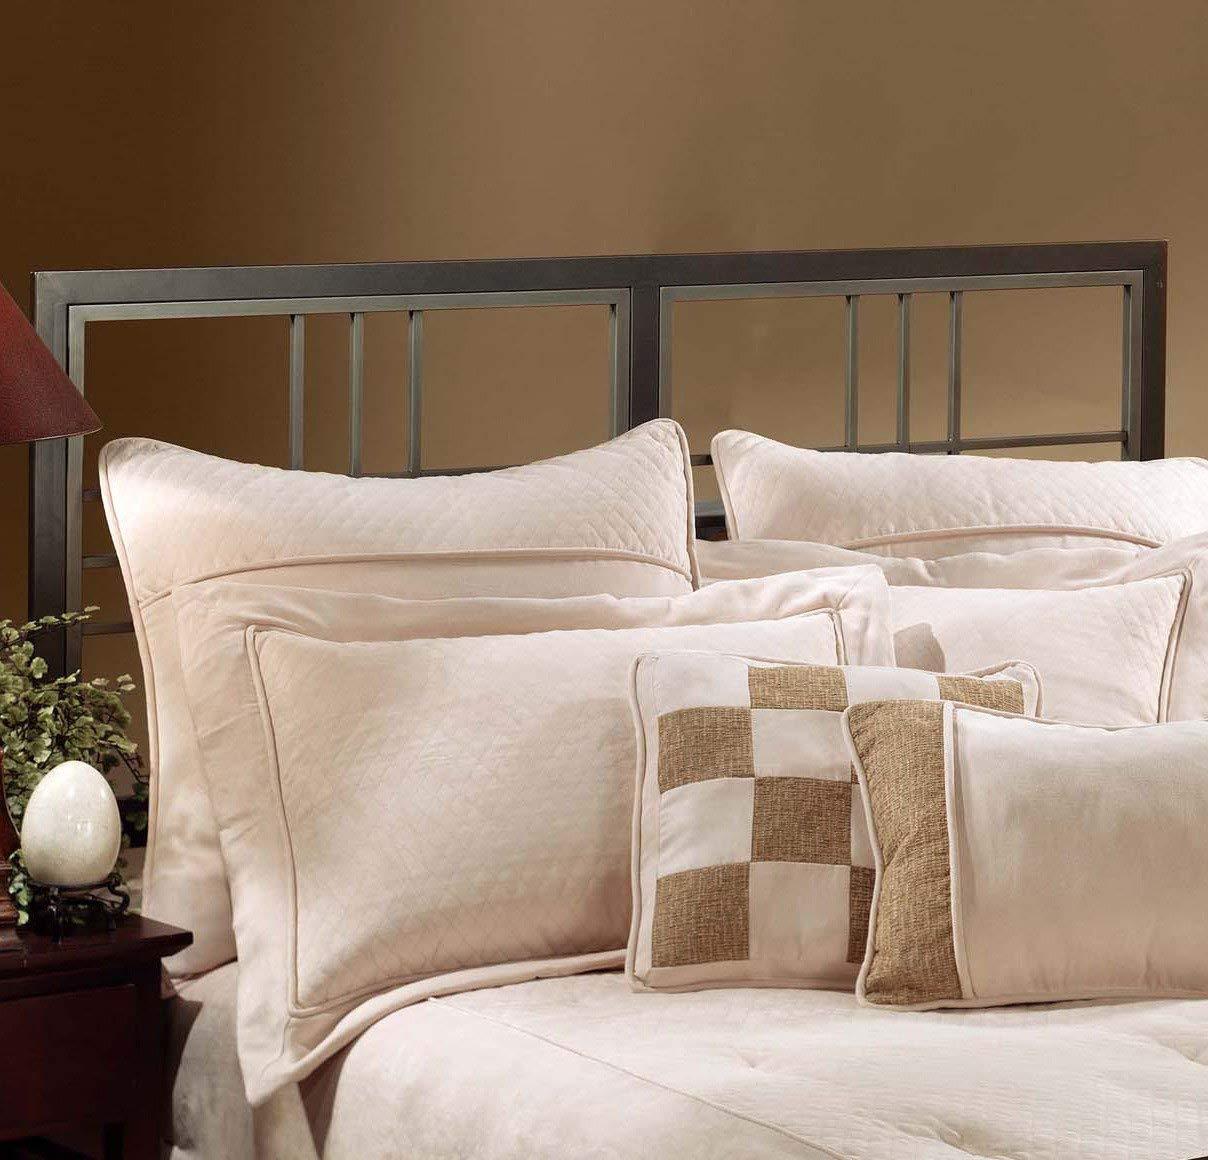 Hillsdale Furniture 1334BFR Tiburon Bed Set with Rails, Full, Magnesium Pewter